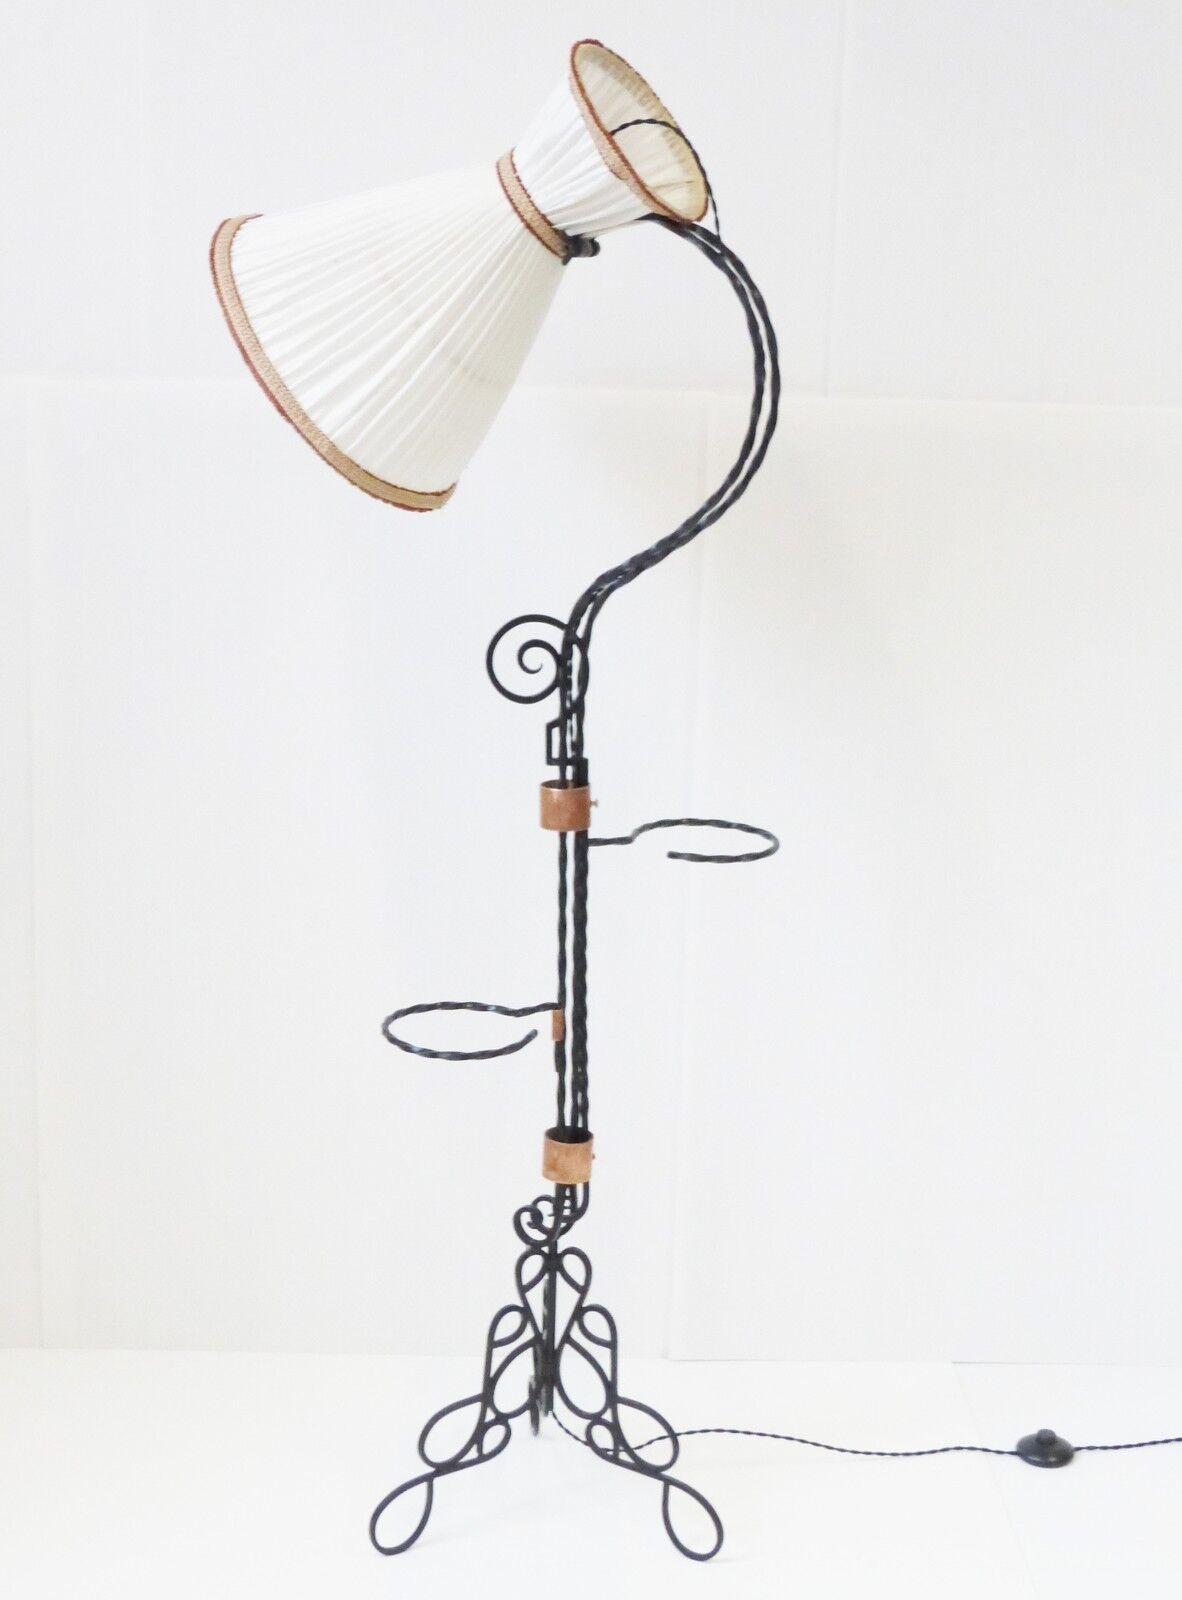 SUPERBE LAMPADAIRE DIABOLO PORTE-PLANTES AMOVIBLES 1950 VINTAGE FLOOR LAMP